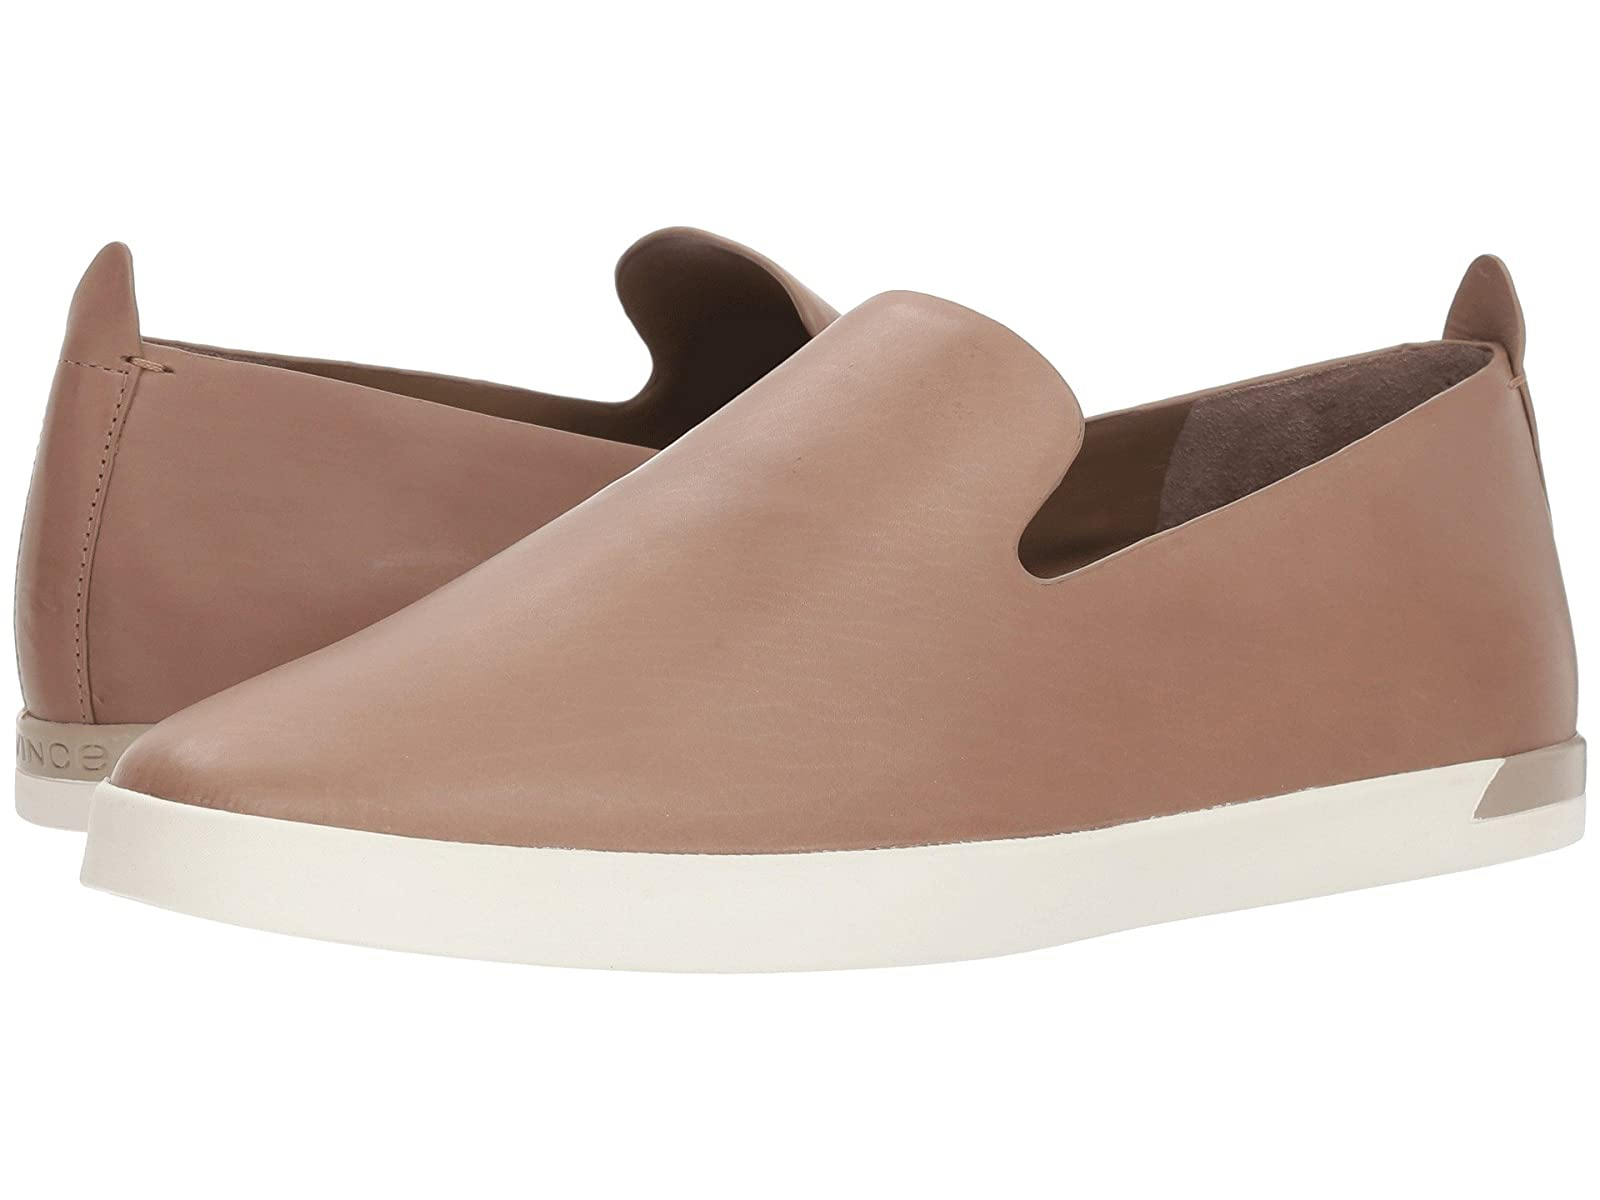 Vince VeroAtmospheric grades have affordable shoes